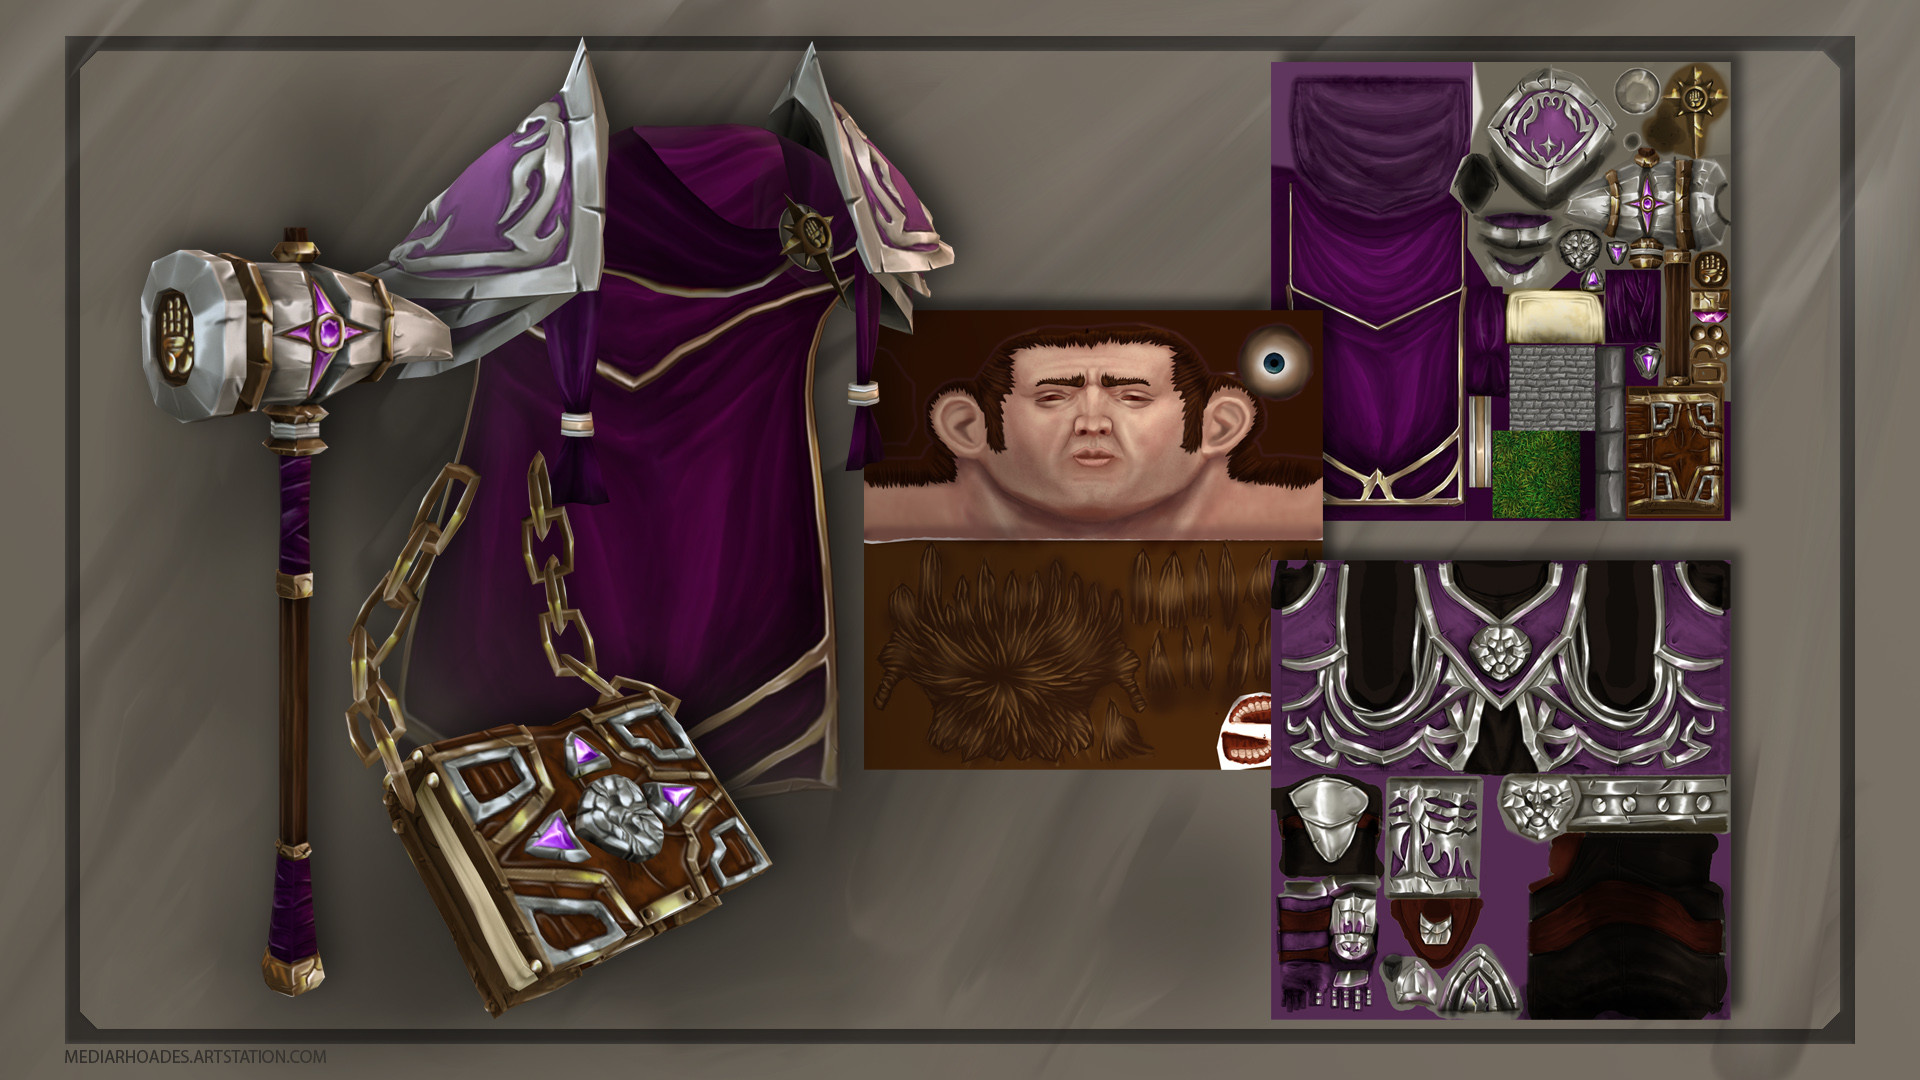 Mason rhoades textures accessories01